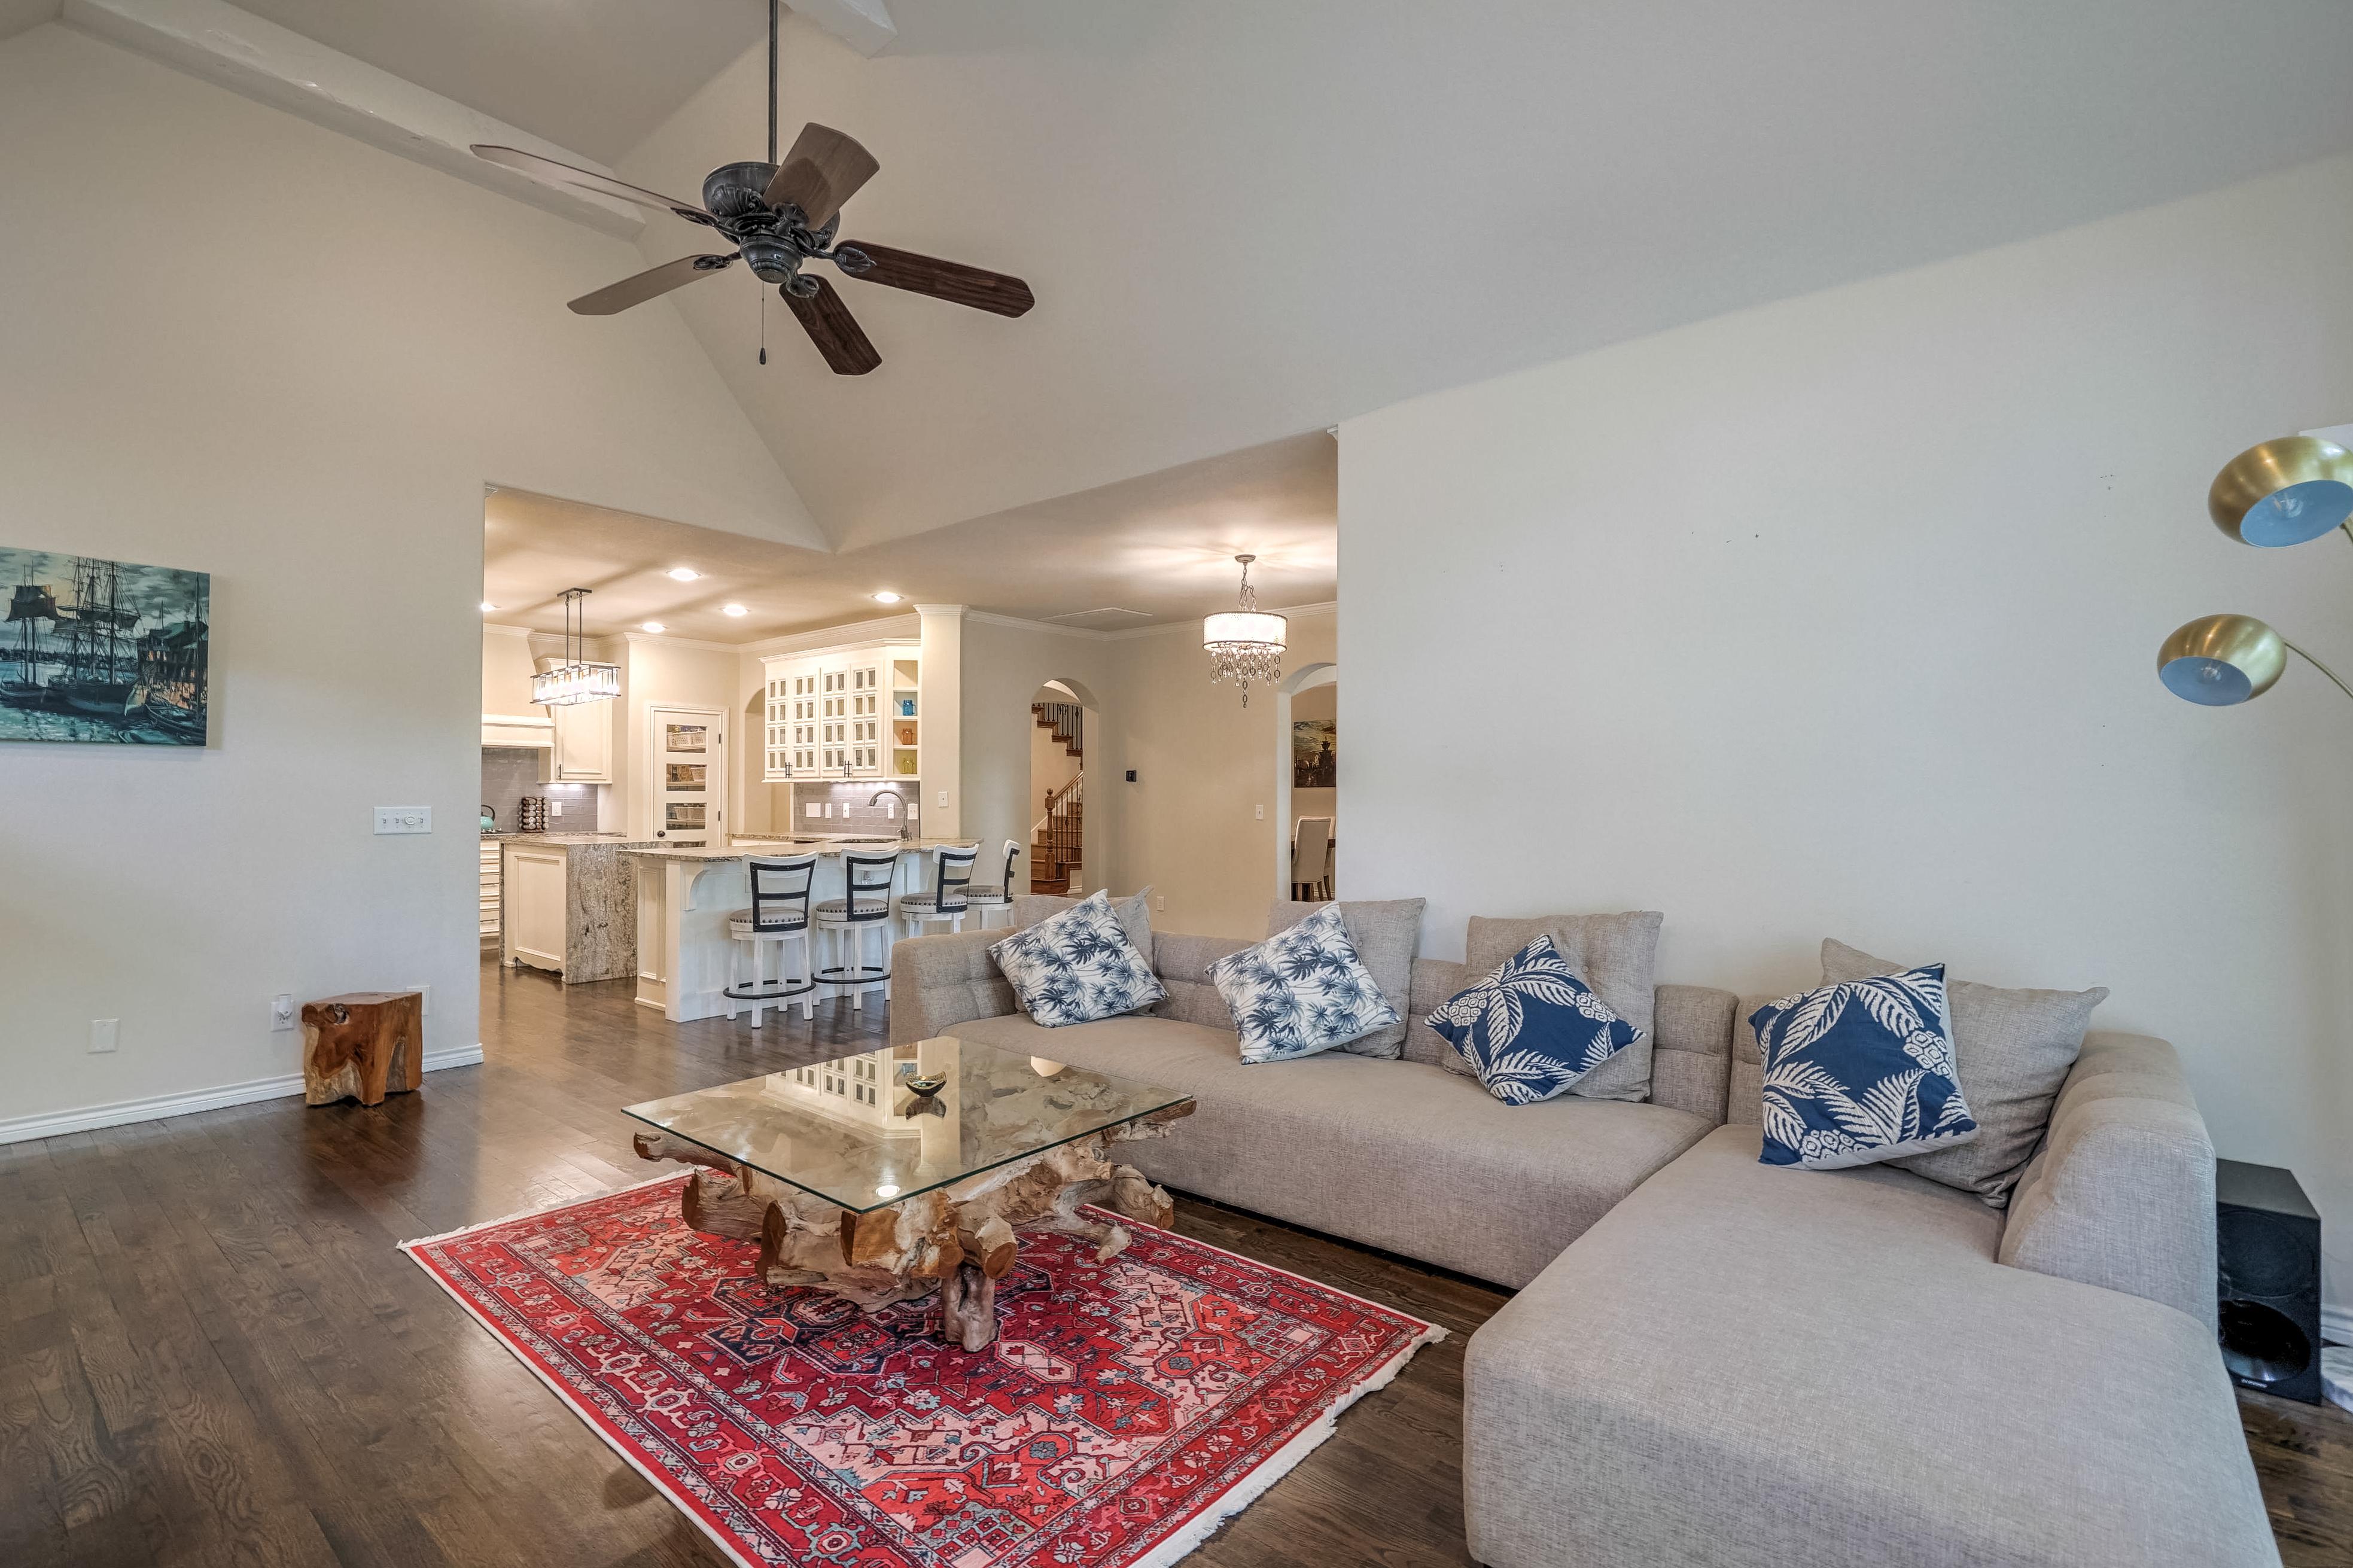 10320 S 92nd East Avenue Property Photo 22